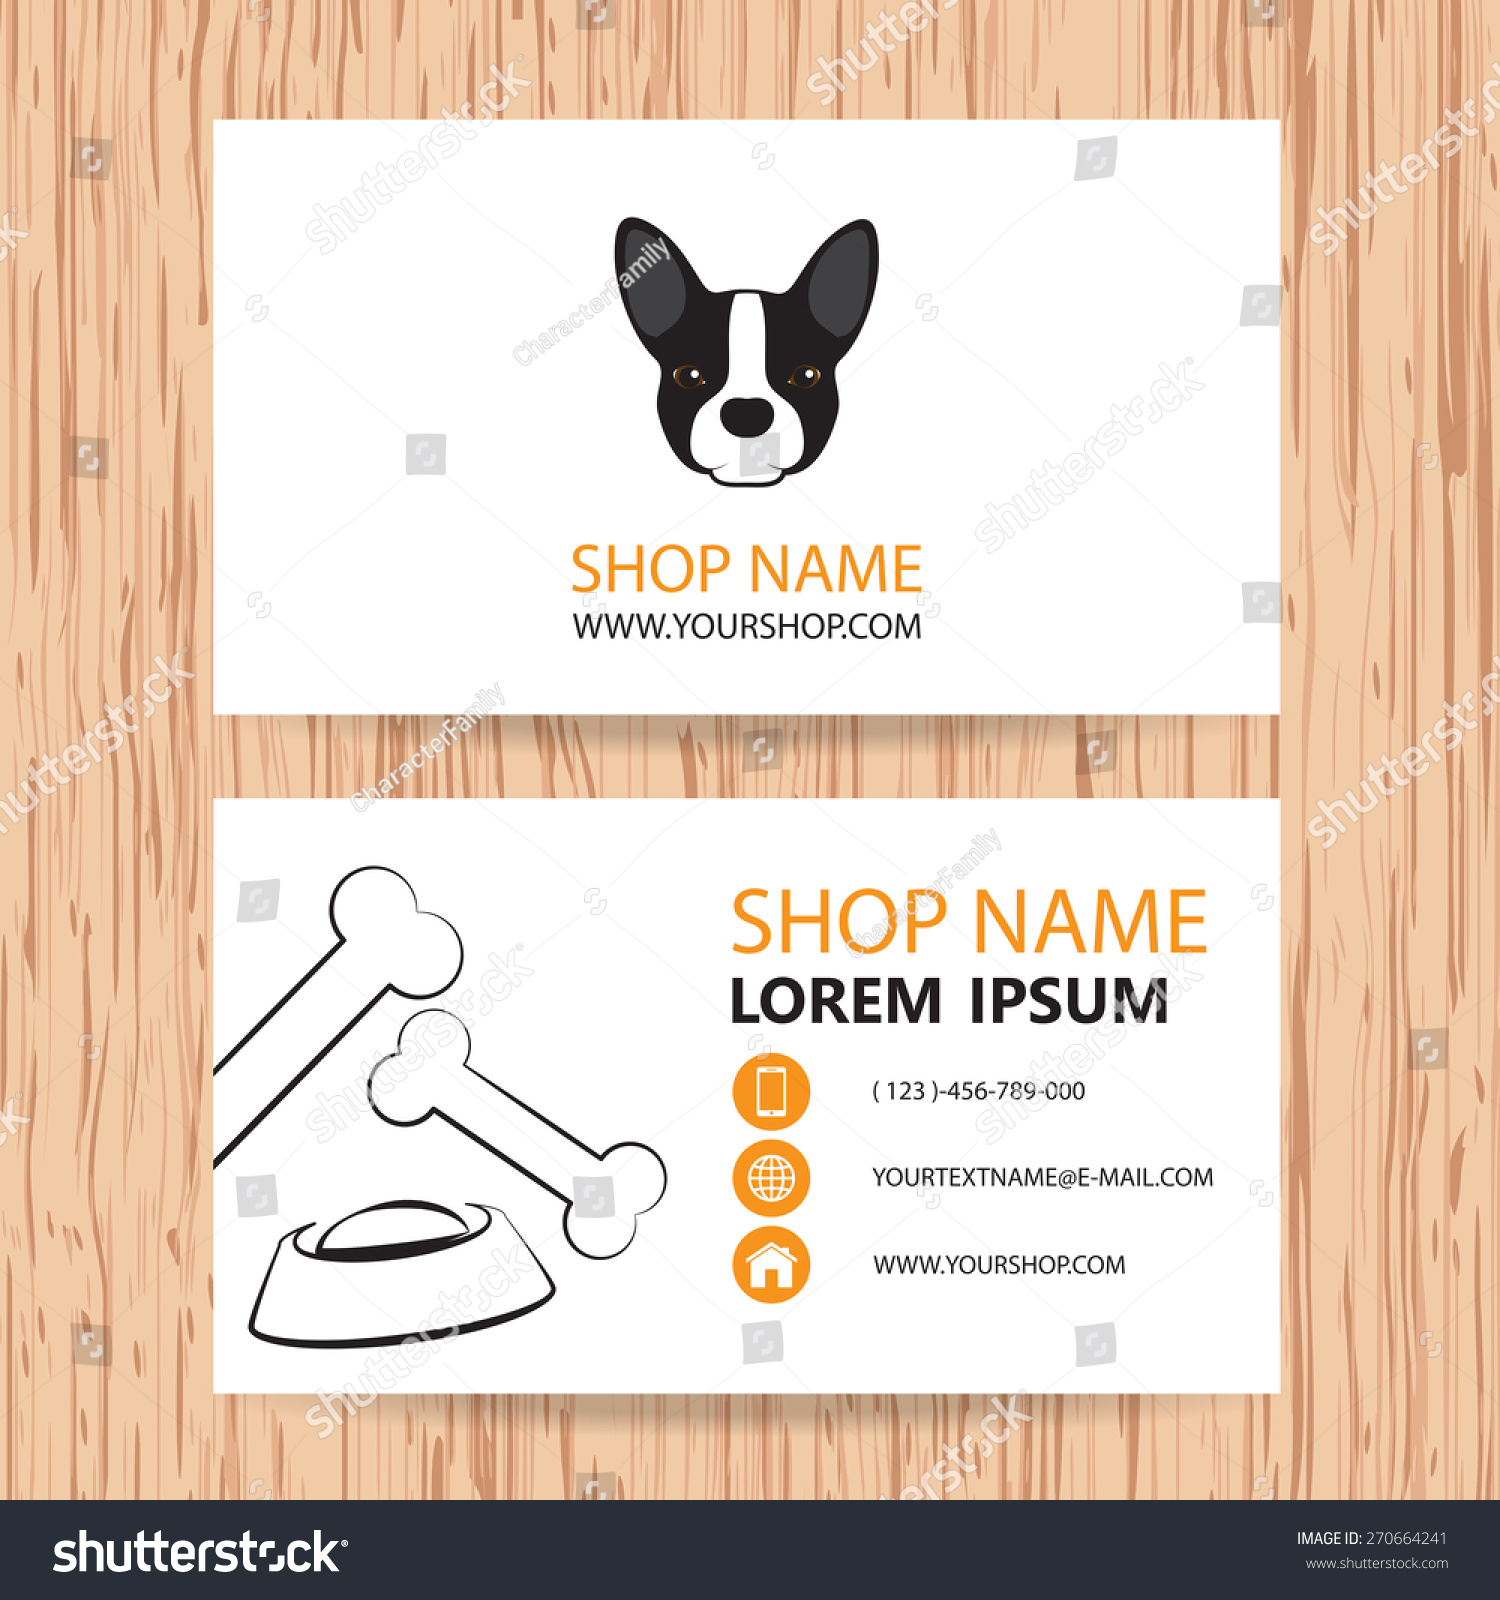 Business Card Vector Background Veterinaryshop Animal Stock Vector ...